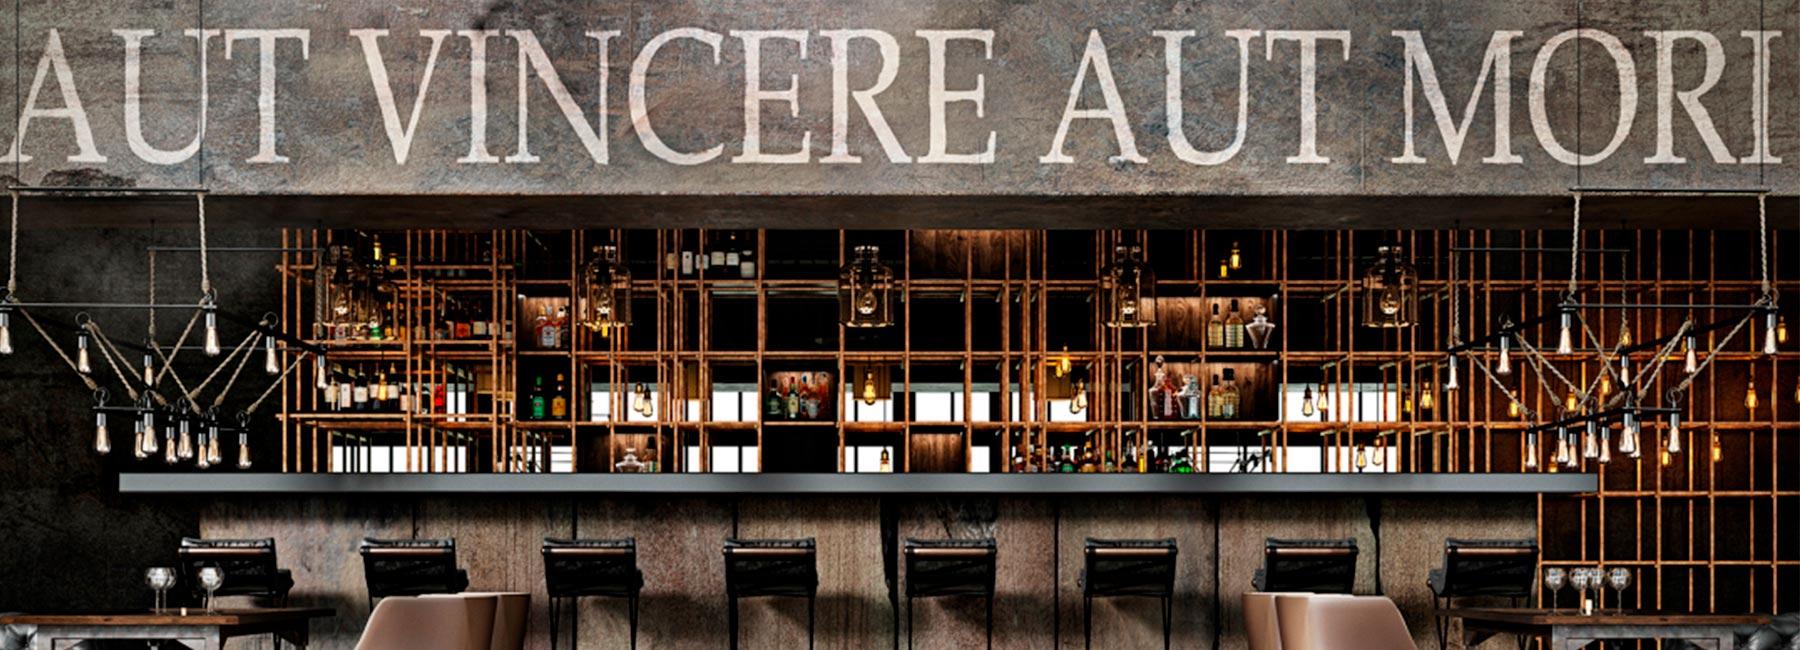 Потрясающий проект ресторана «Aut Vincere aut Mori»